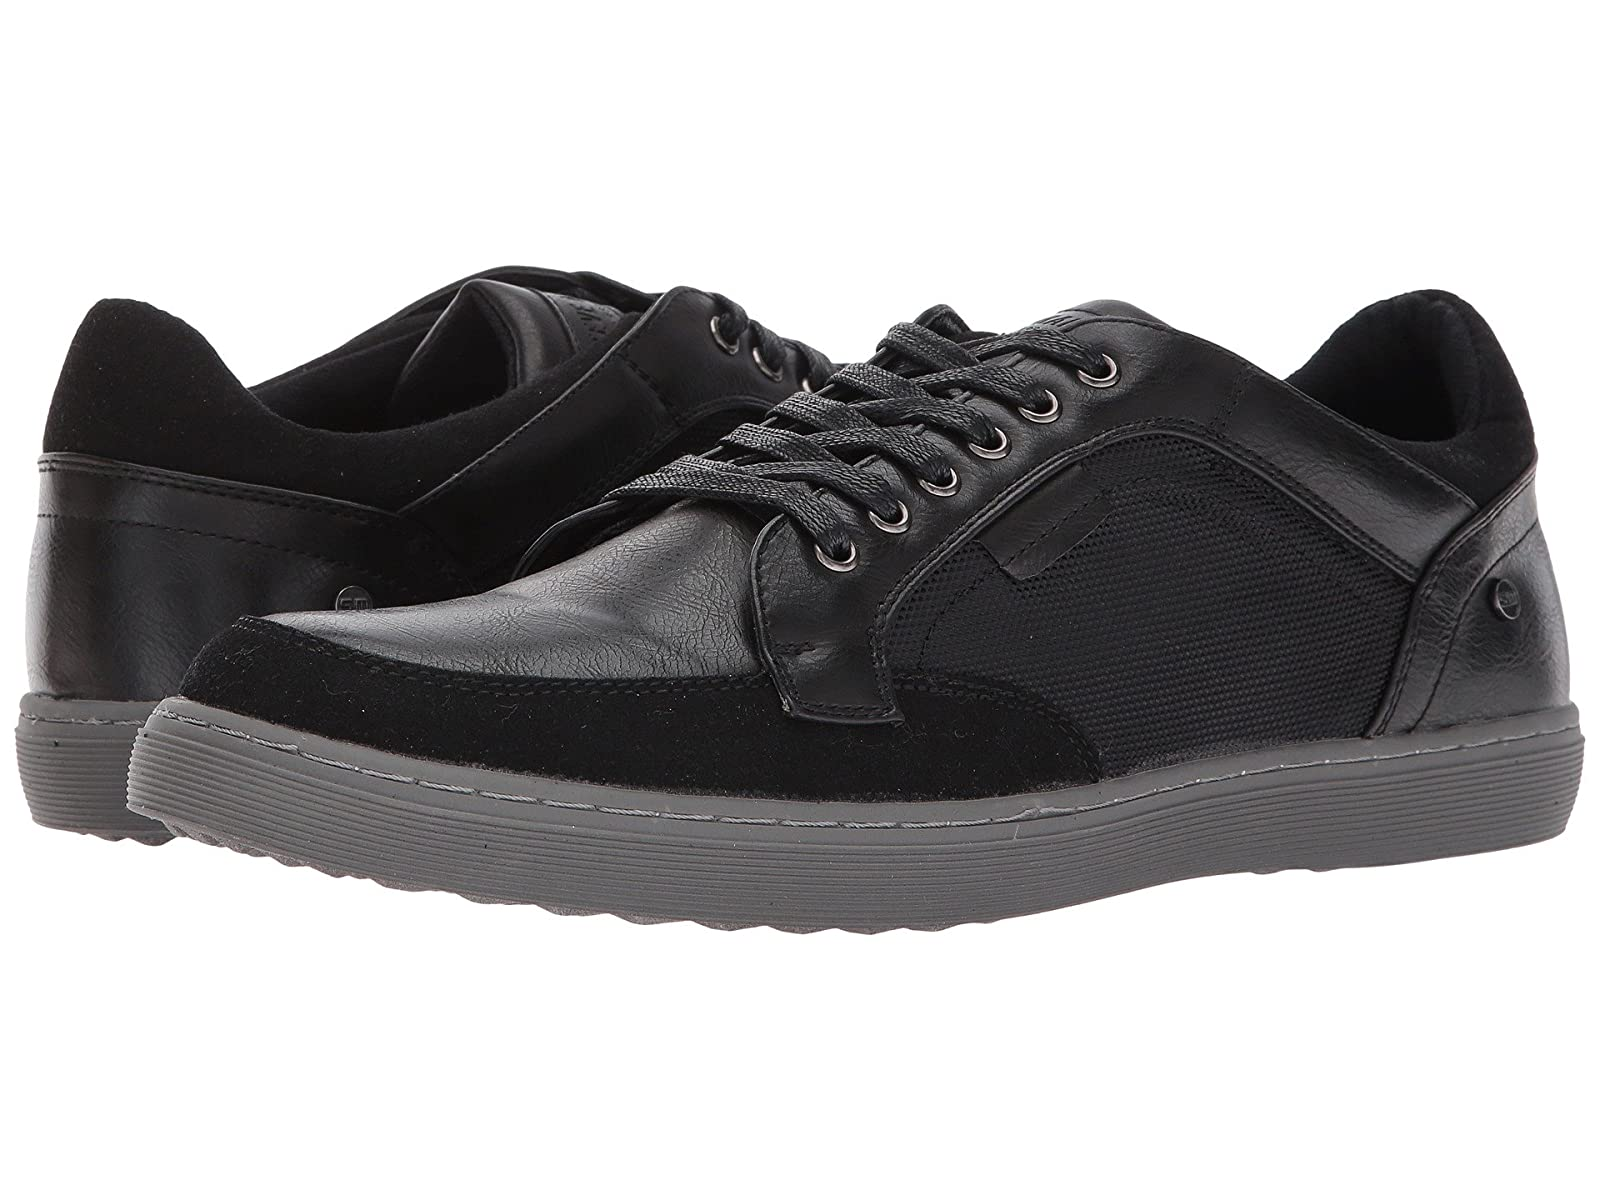 Steve Madden GasperCheap and distinctive eye-catching shoes